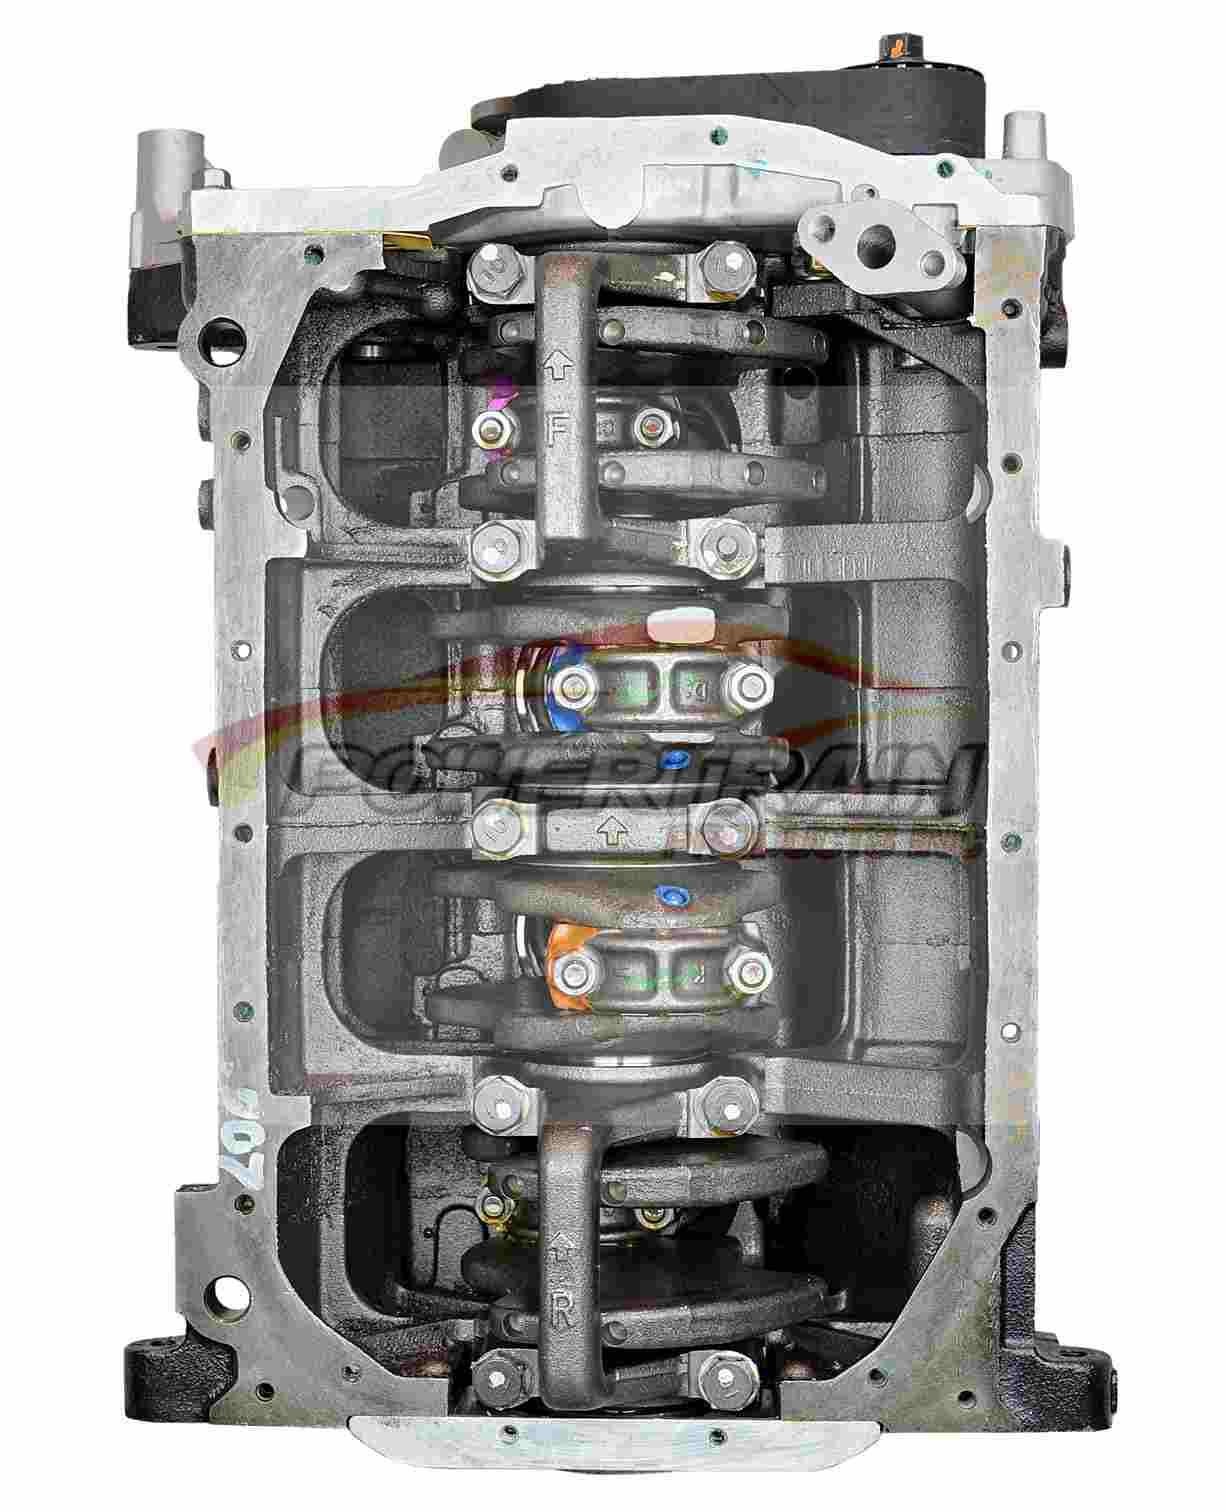 1997 s10 l4 2 vacuum diagram wiring schematic chevy 2 2l engine diagram e3 wiring diagram  chevy 2 2l engine diagram e3 wiring